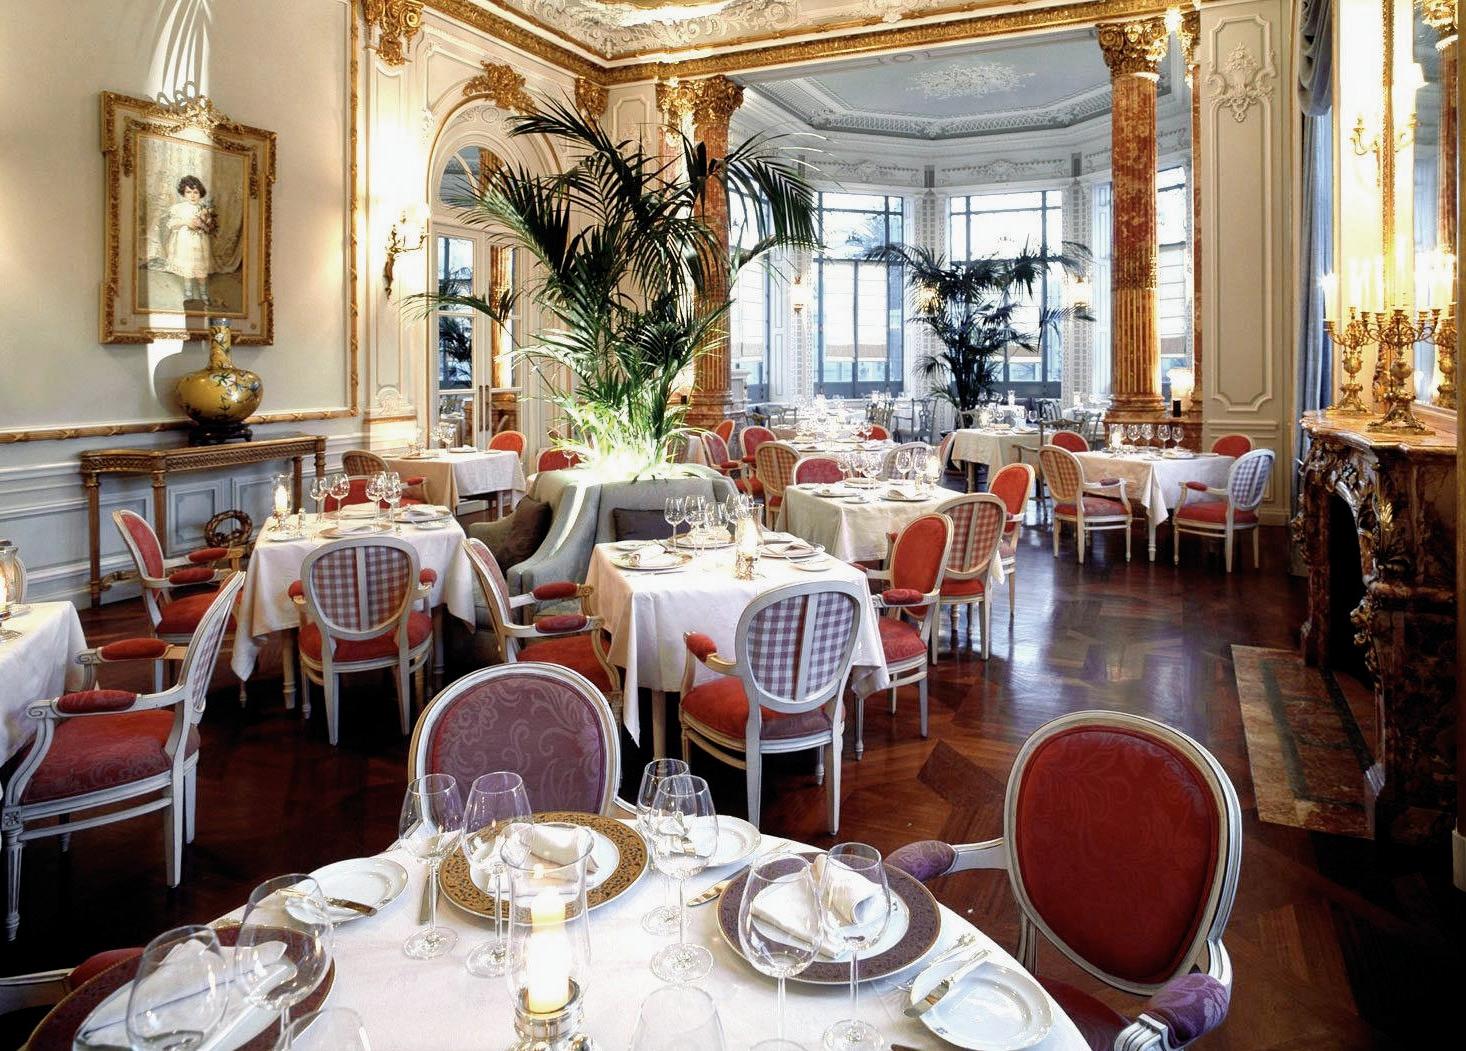 Restaurant Valle Flor